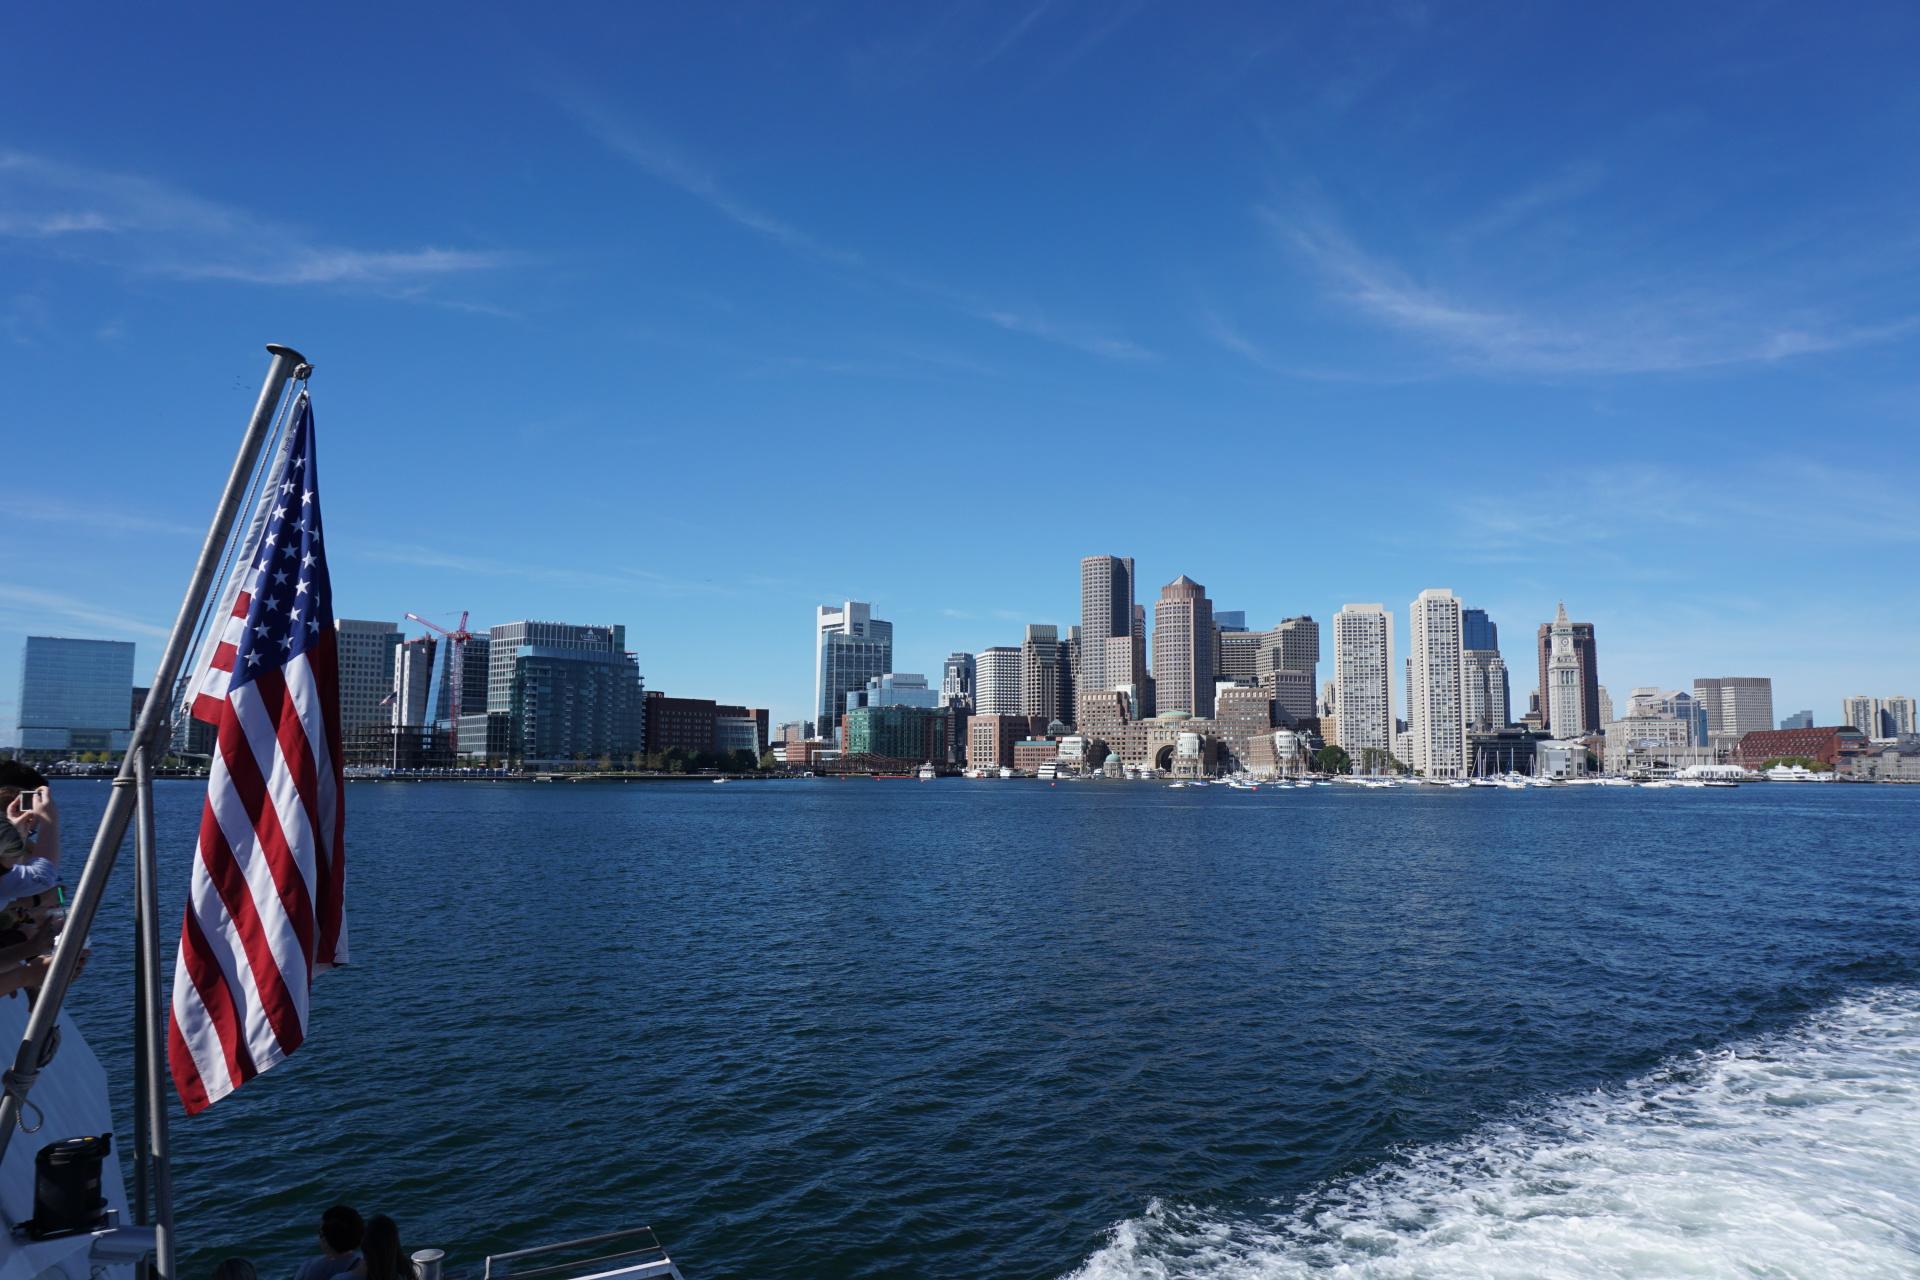 Boston in Photos